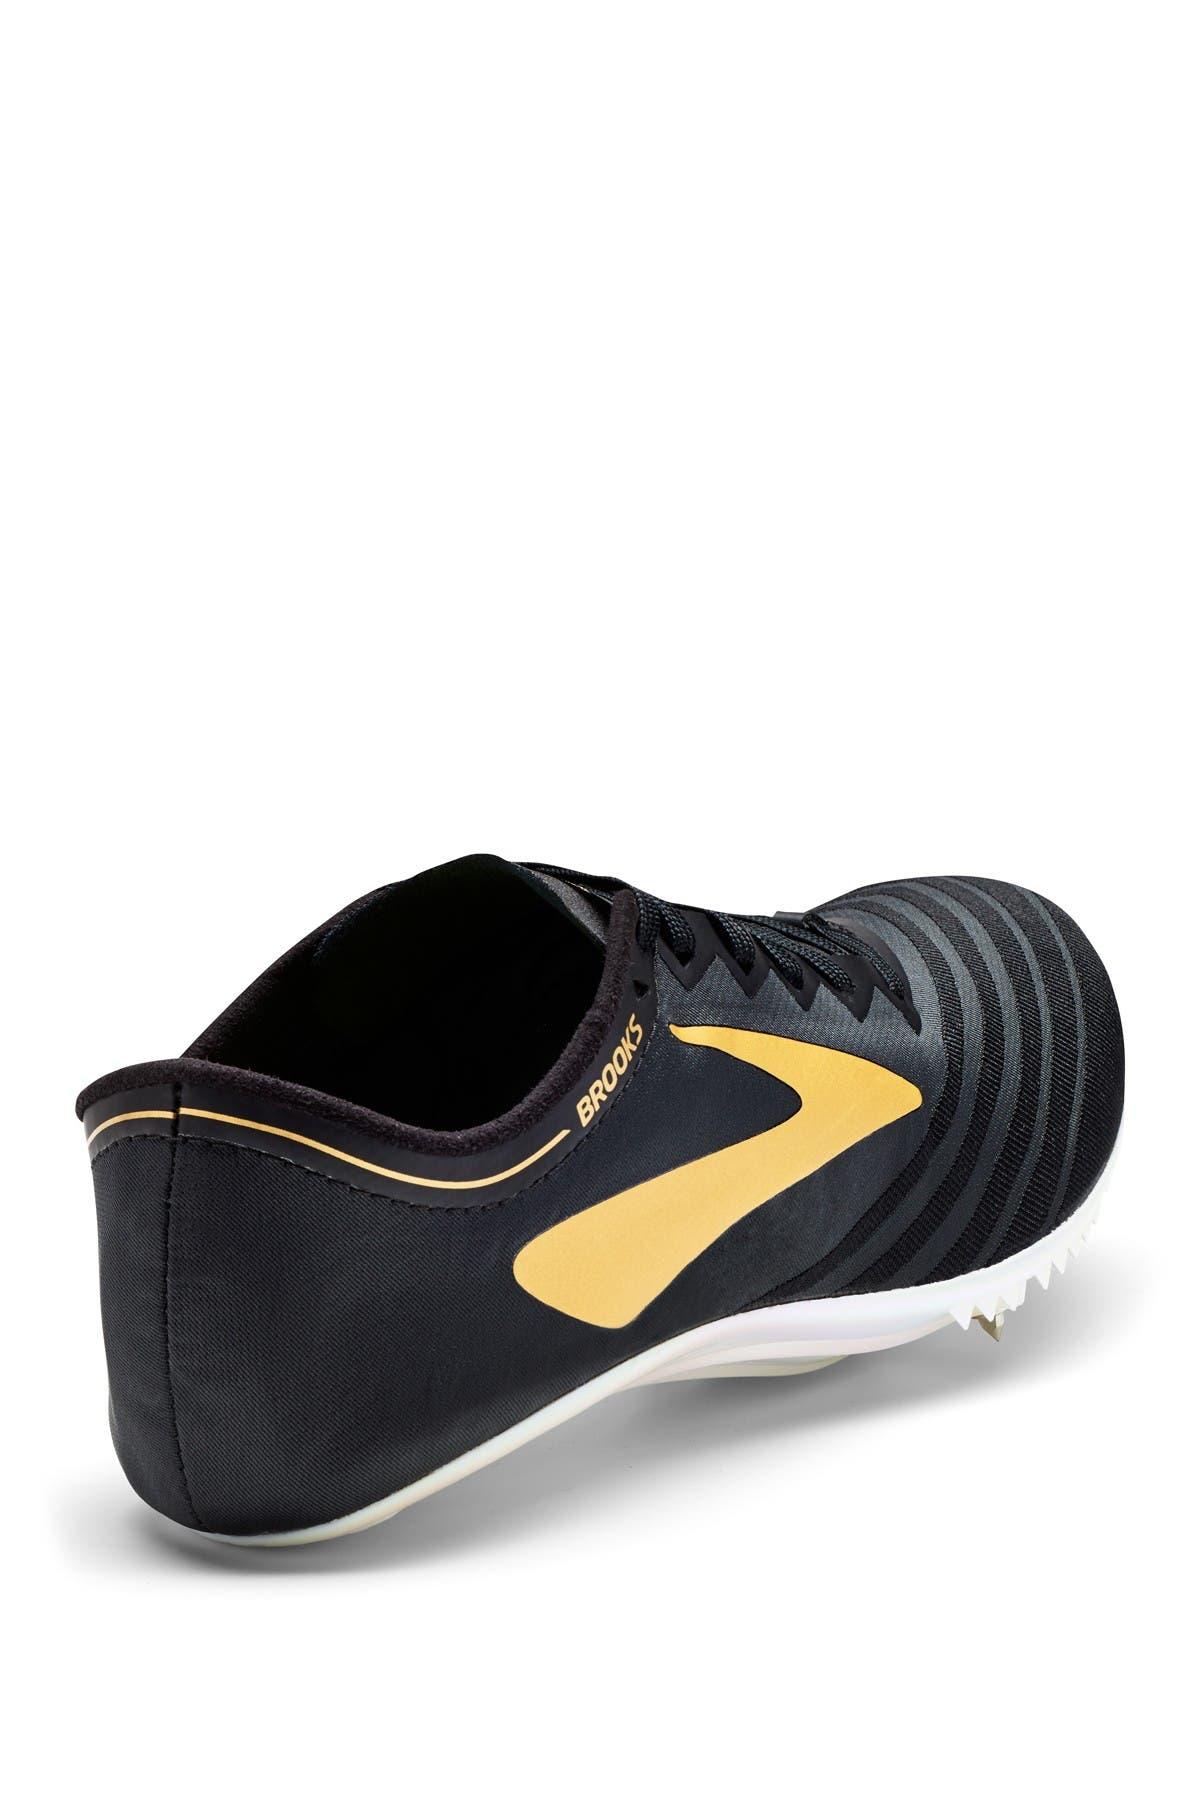 Image of Brooks Signature Running Track Shoe